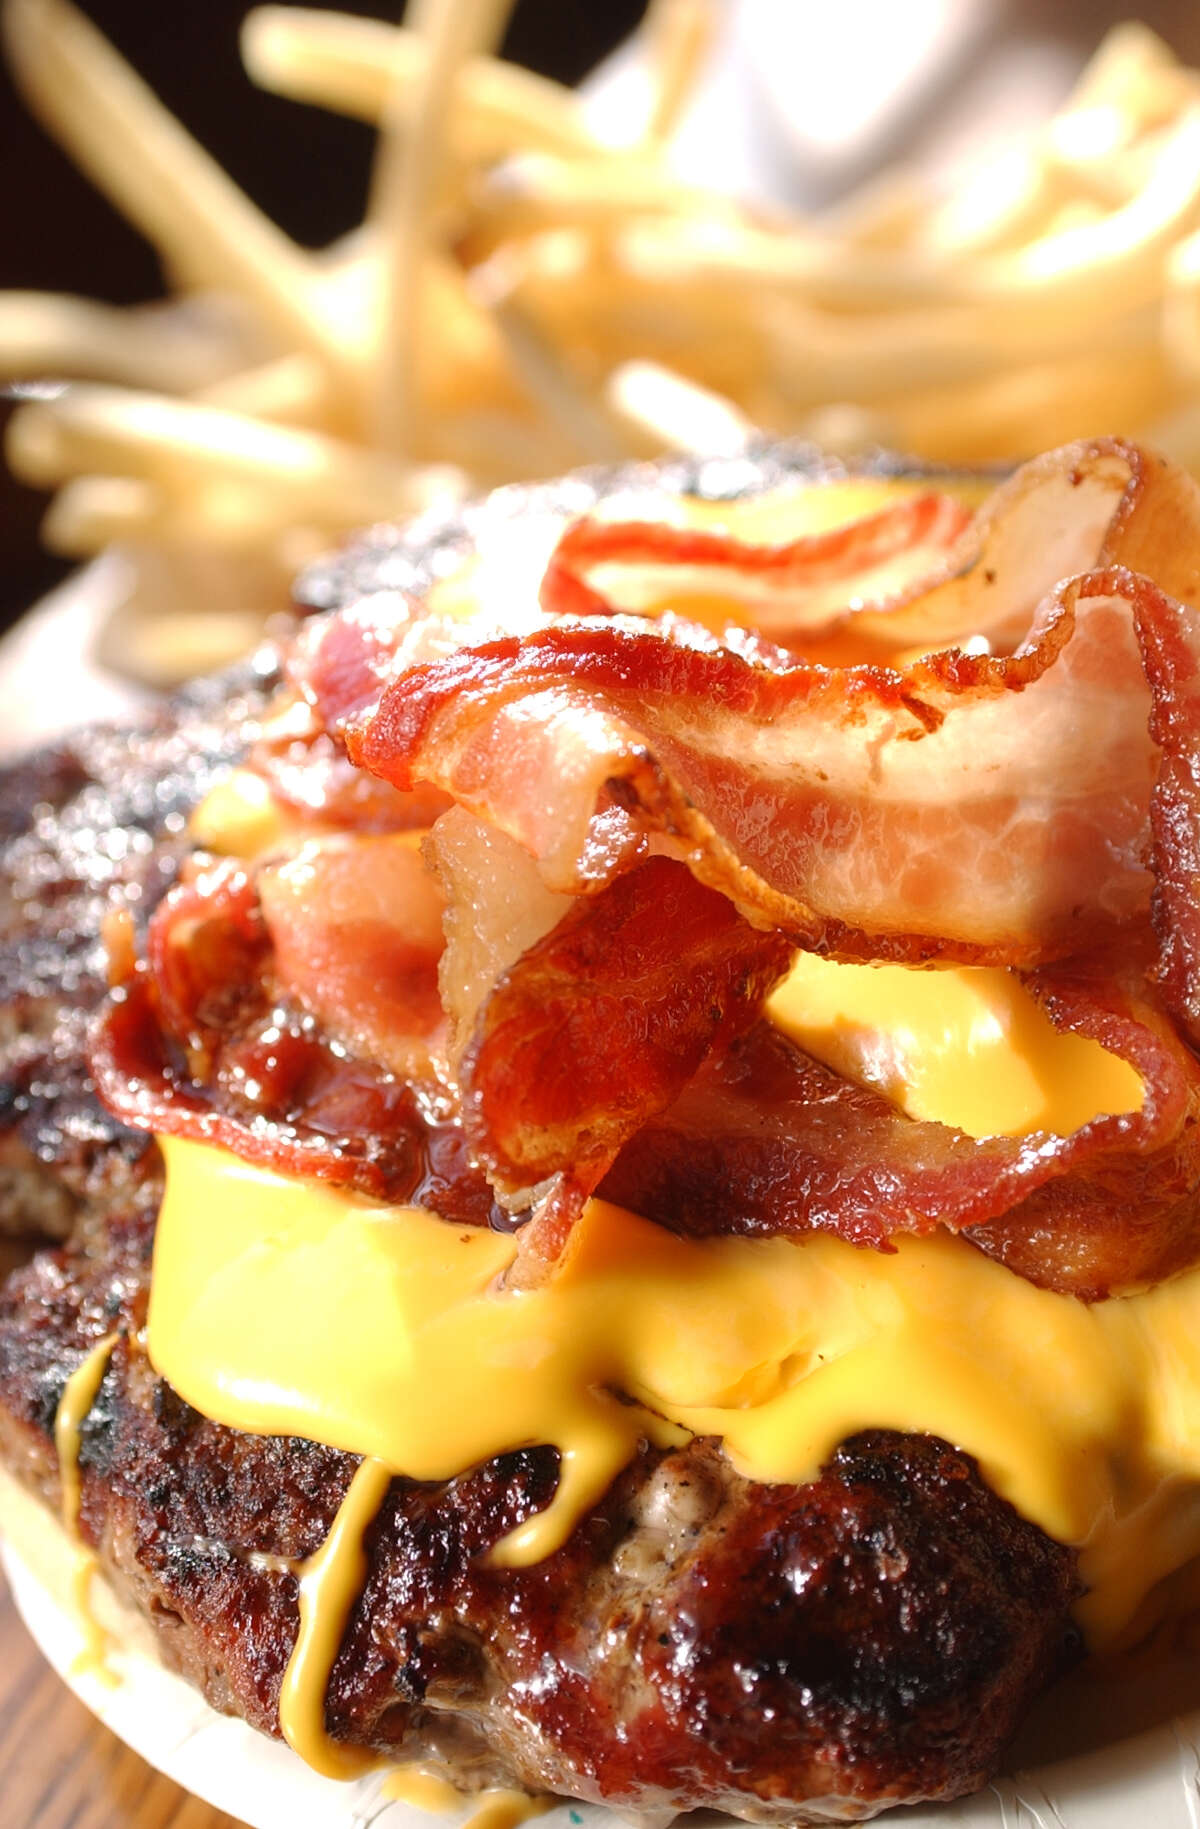 Best hamburger 1. Sutter's Mill, Albany2. Kelty's Iron Horse Pub, Albany3. Beff's, Albany3. Jack's Drive In, Wynantskill